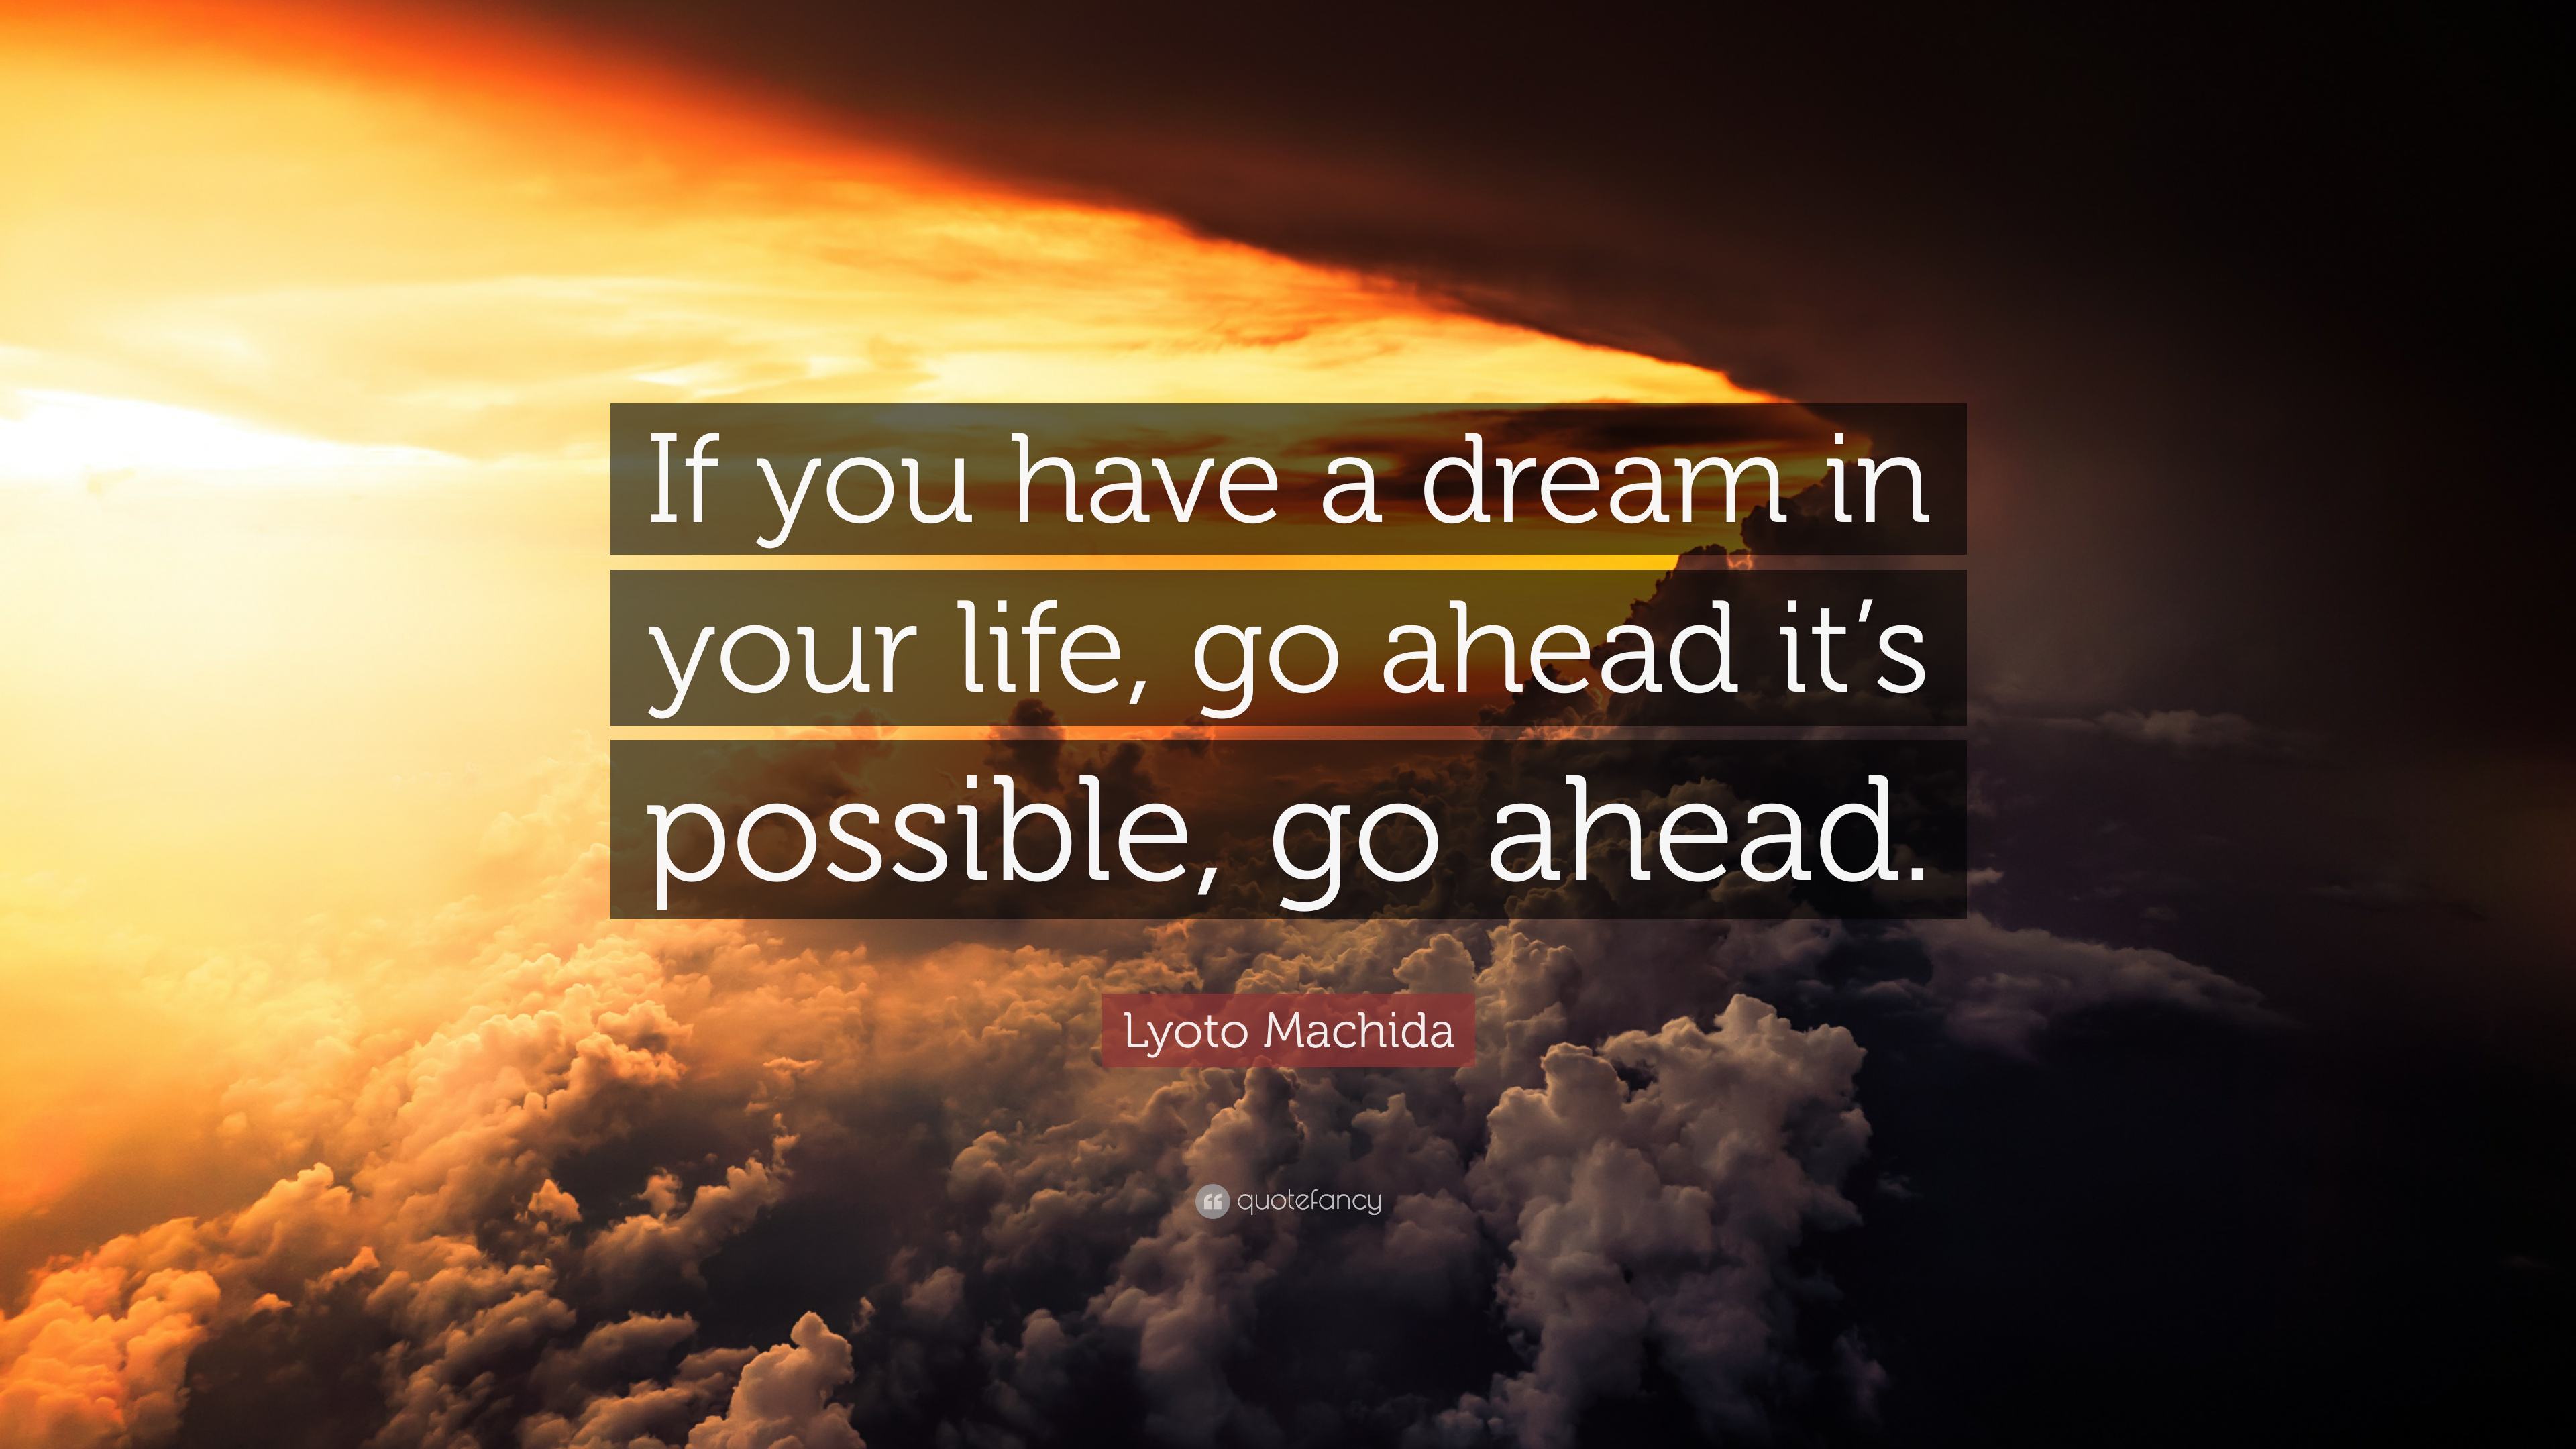 Lyoto Machida Quote: U201cIf You Have A Dream In Your Life, Go Ahead